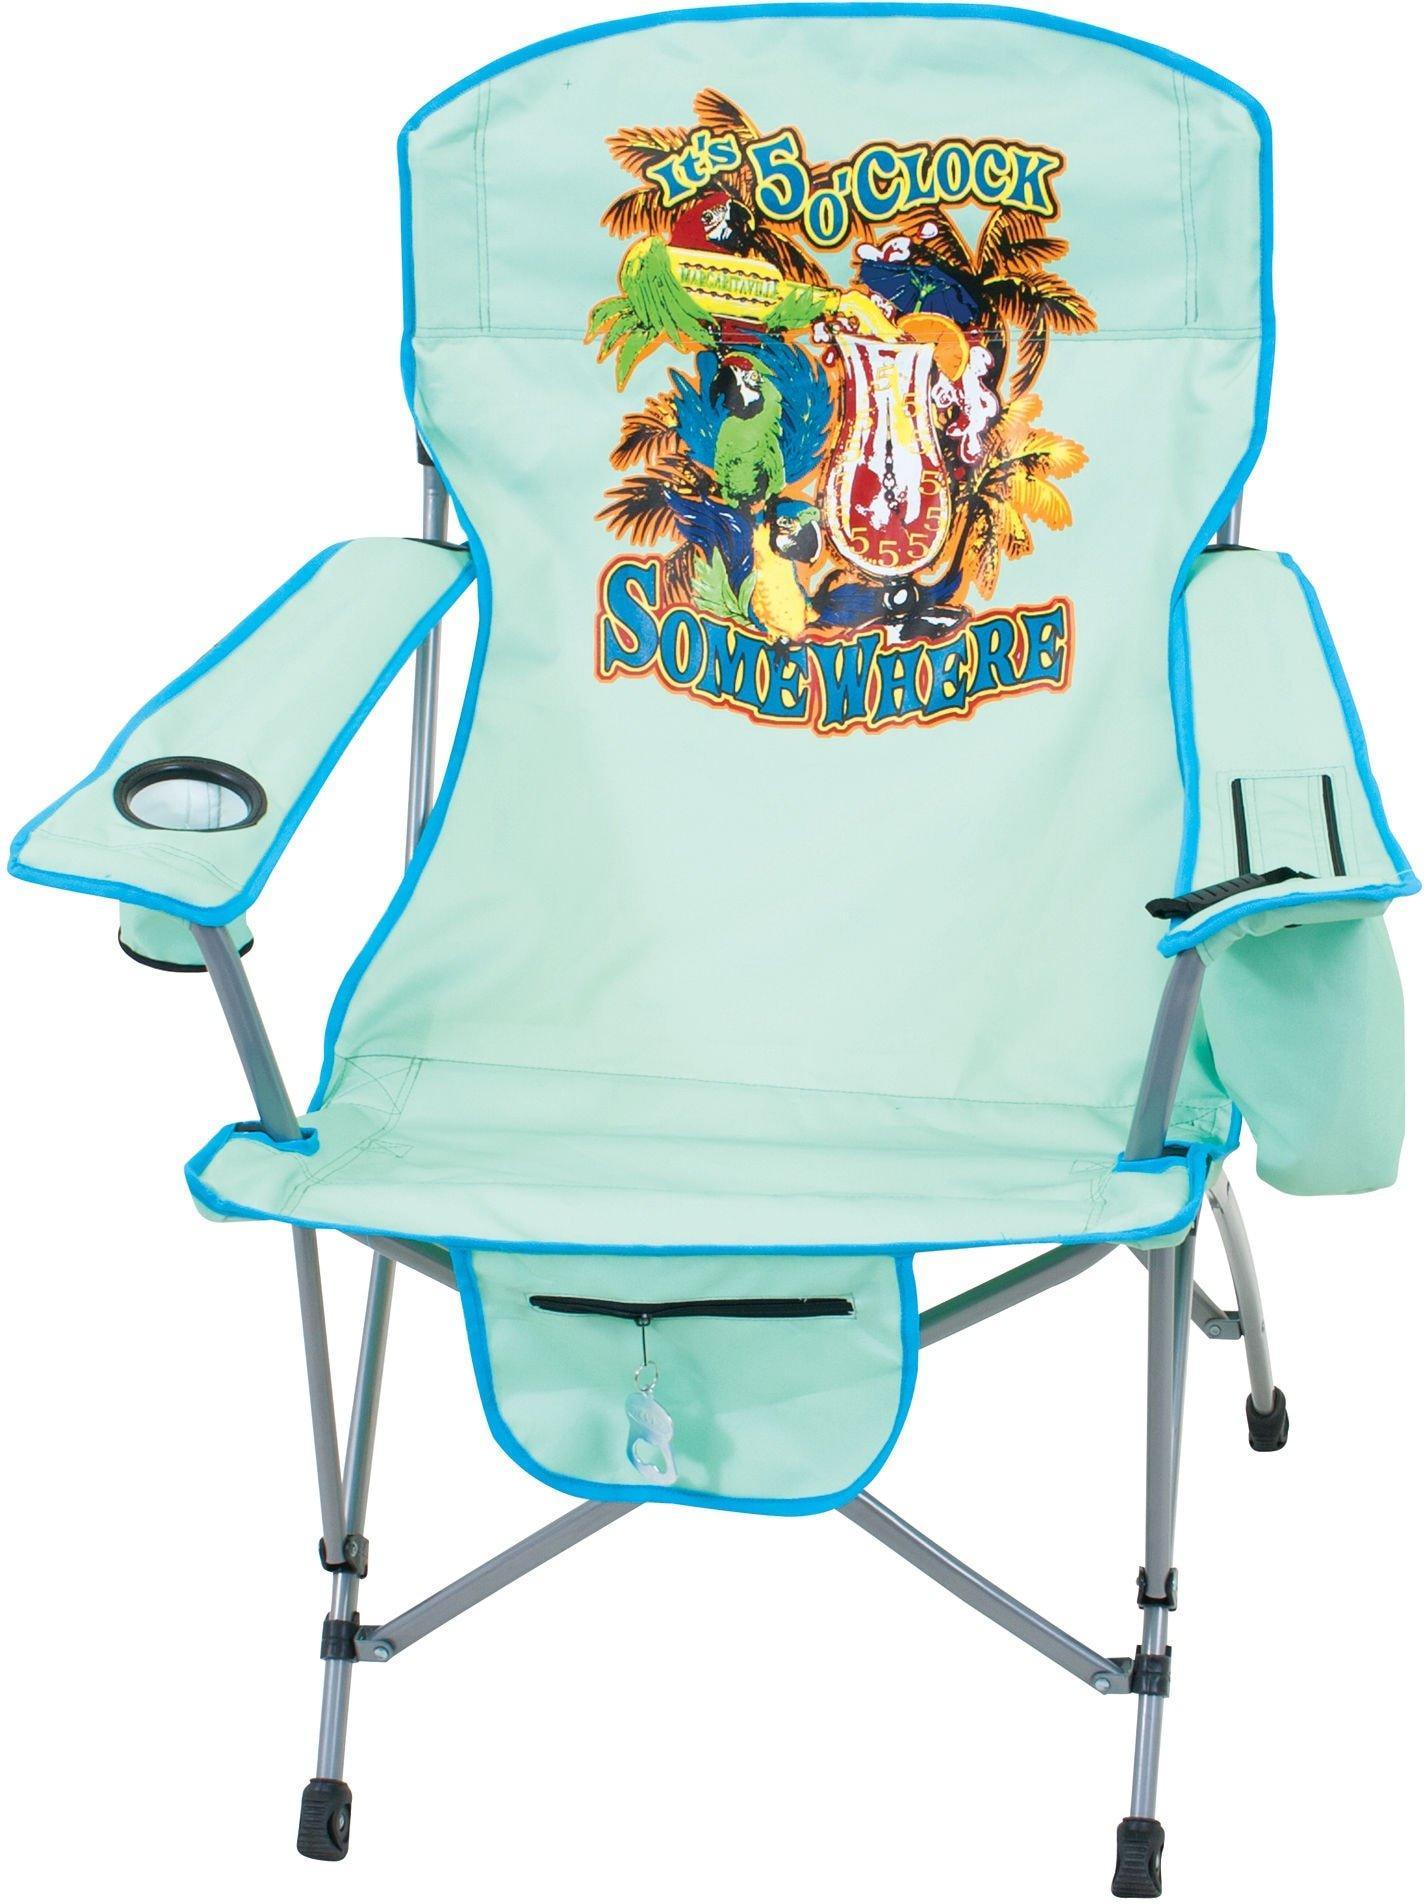 Margaritaville 5 Ou0027clock Somewhere Quad Chair | Bealls Florida